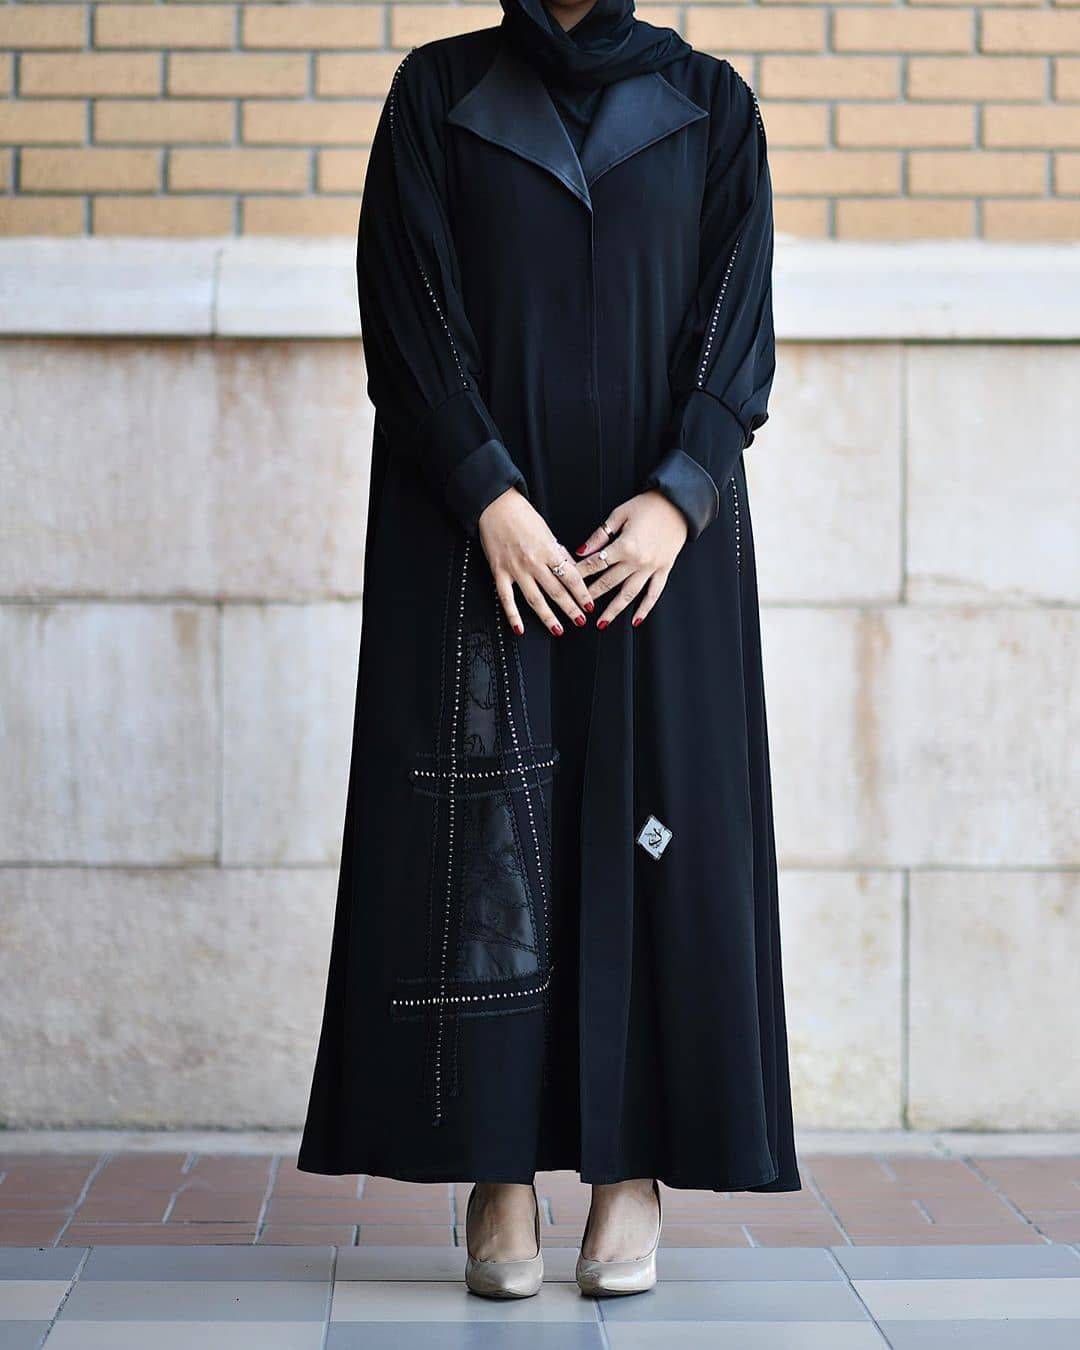 Subhan Abayas Sur Instagram Repost Ab Photoshoot New Collection By Dar Ward3 Subhanabayas Abaya Fashion Abaya Fashion Vogue Fashion